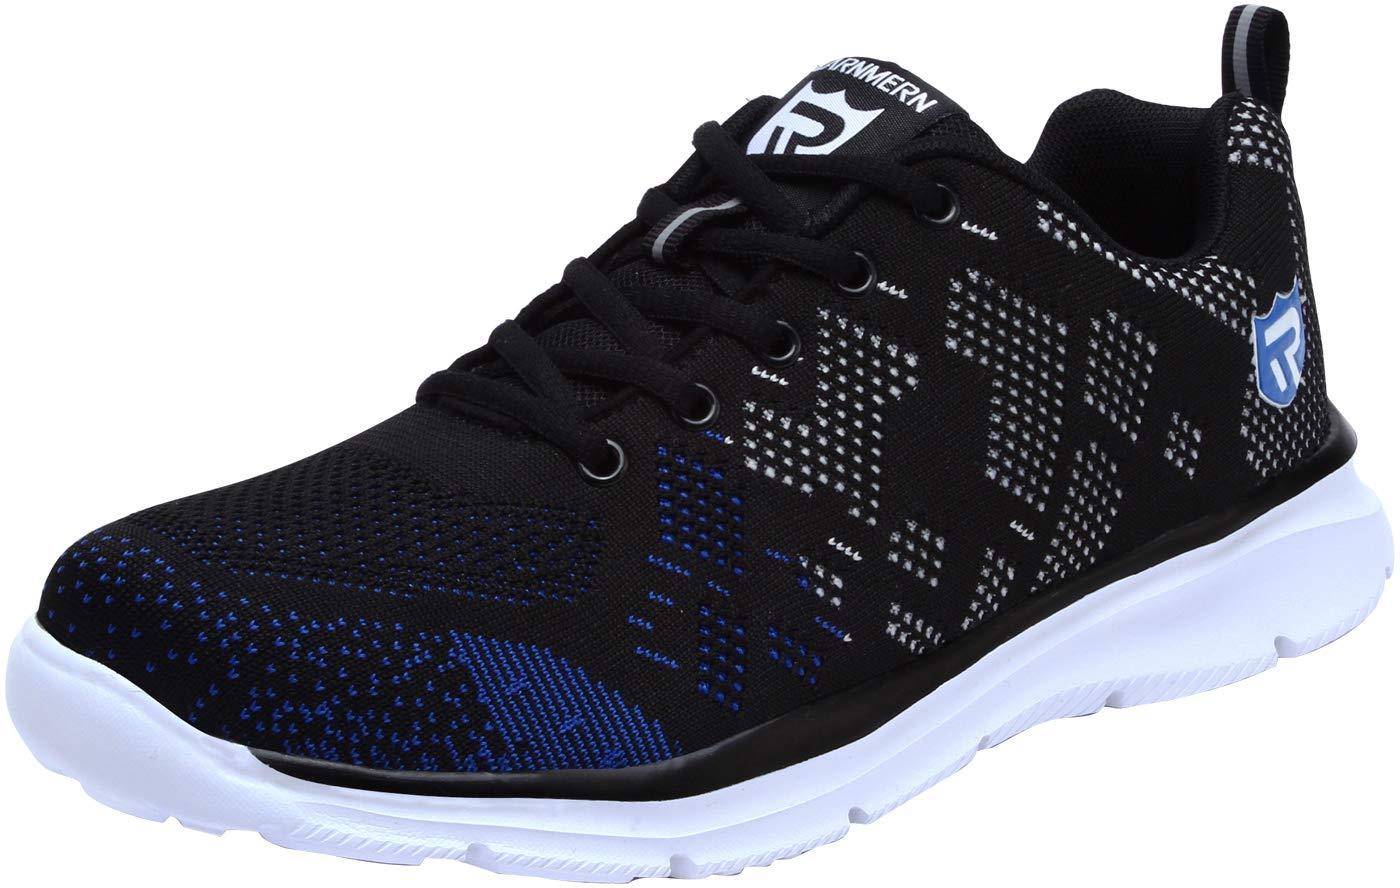 LARNMERN Men's Safety Steel Toe Cap Work Shoes Slip Resistance Anti